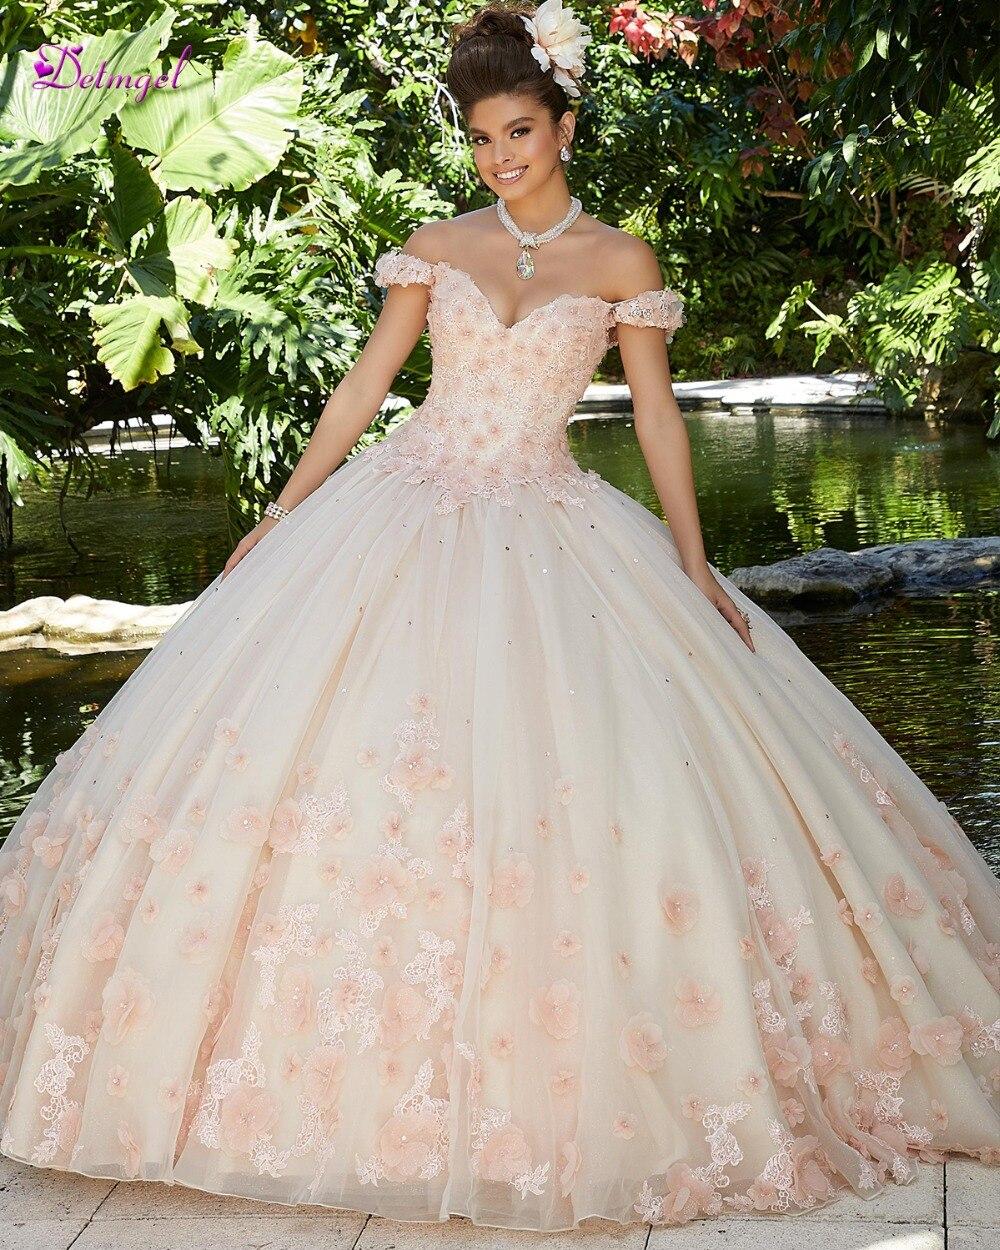 Detmgel Sexy bateau cou perlé fleurs robe de bal Quinceanera robes 2019 de luxe Appliques Debutante robe pour Vestido de 15 anos